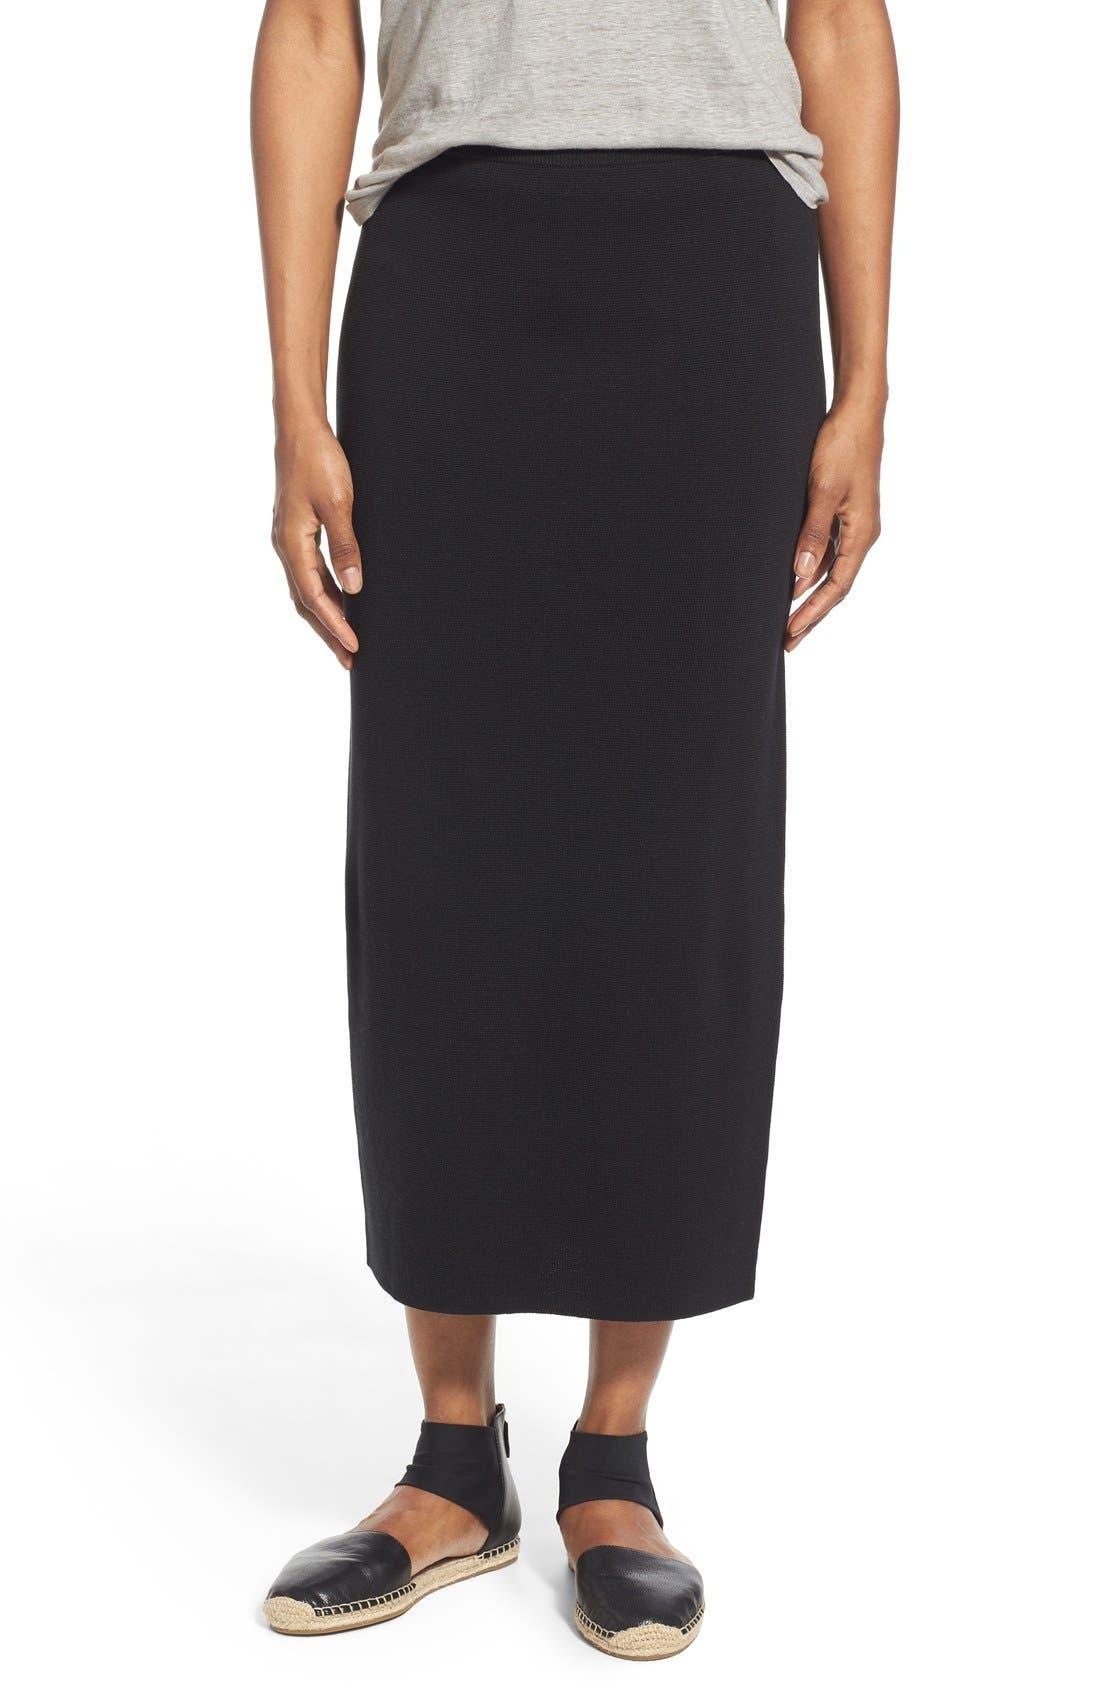 Alternate Image 1 Selected - Eileen Fisher Silk & Cotton Interlock Knit Pencil Skirt (Regular & Petite)